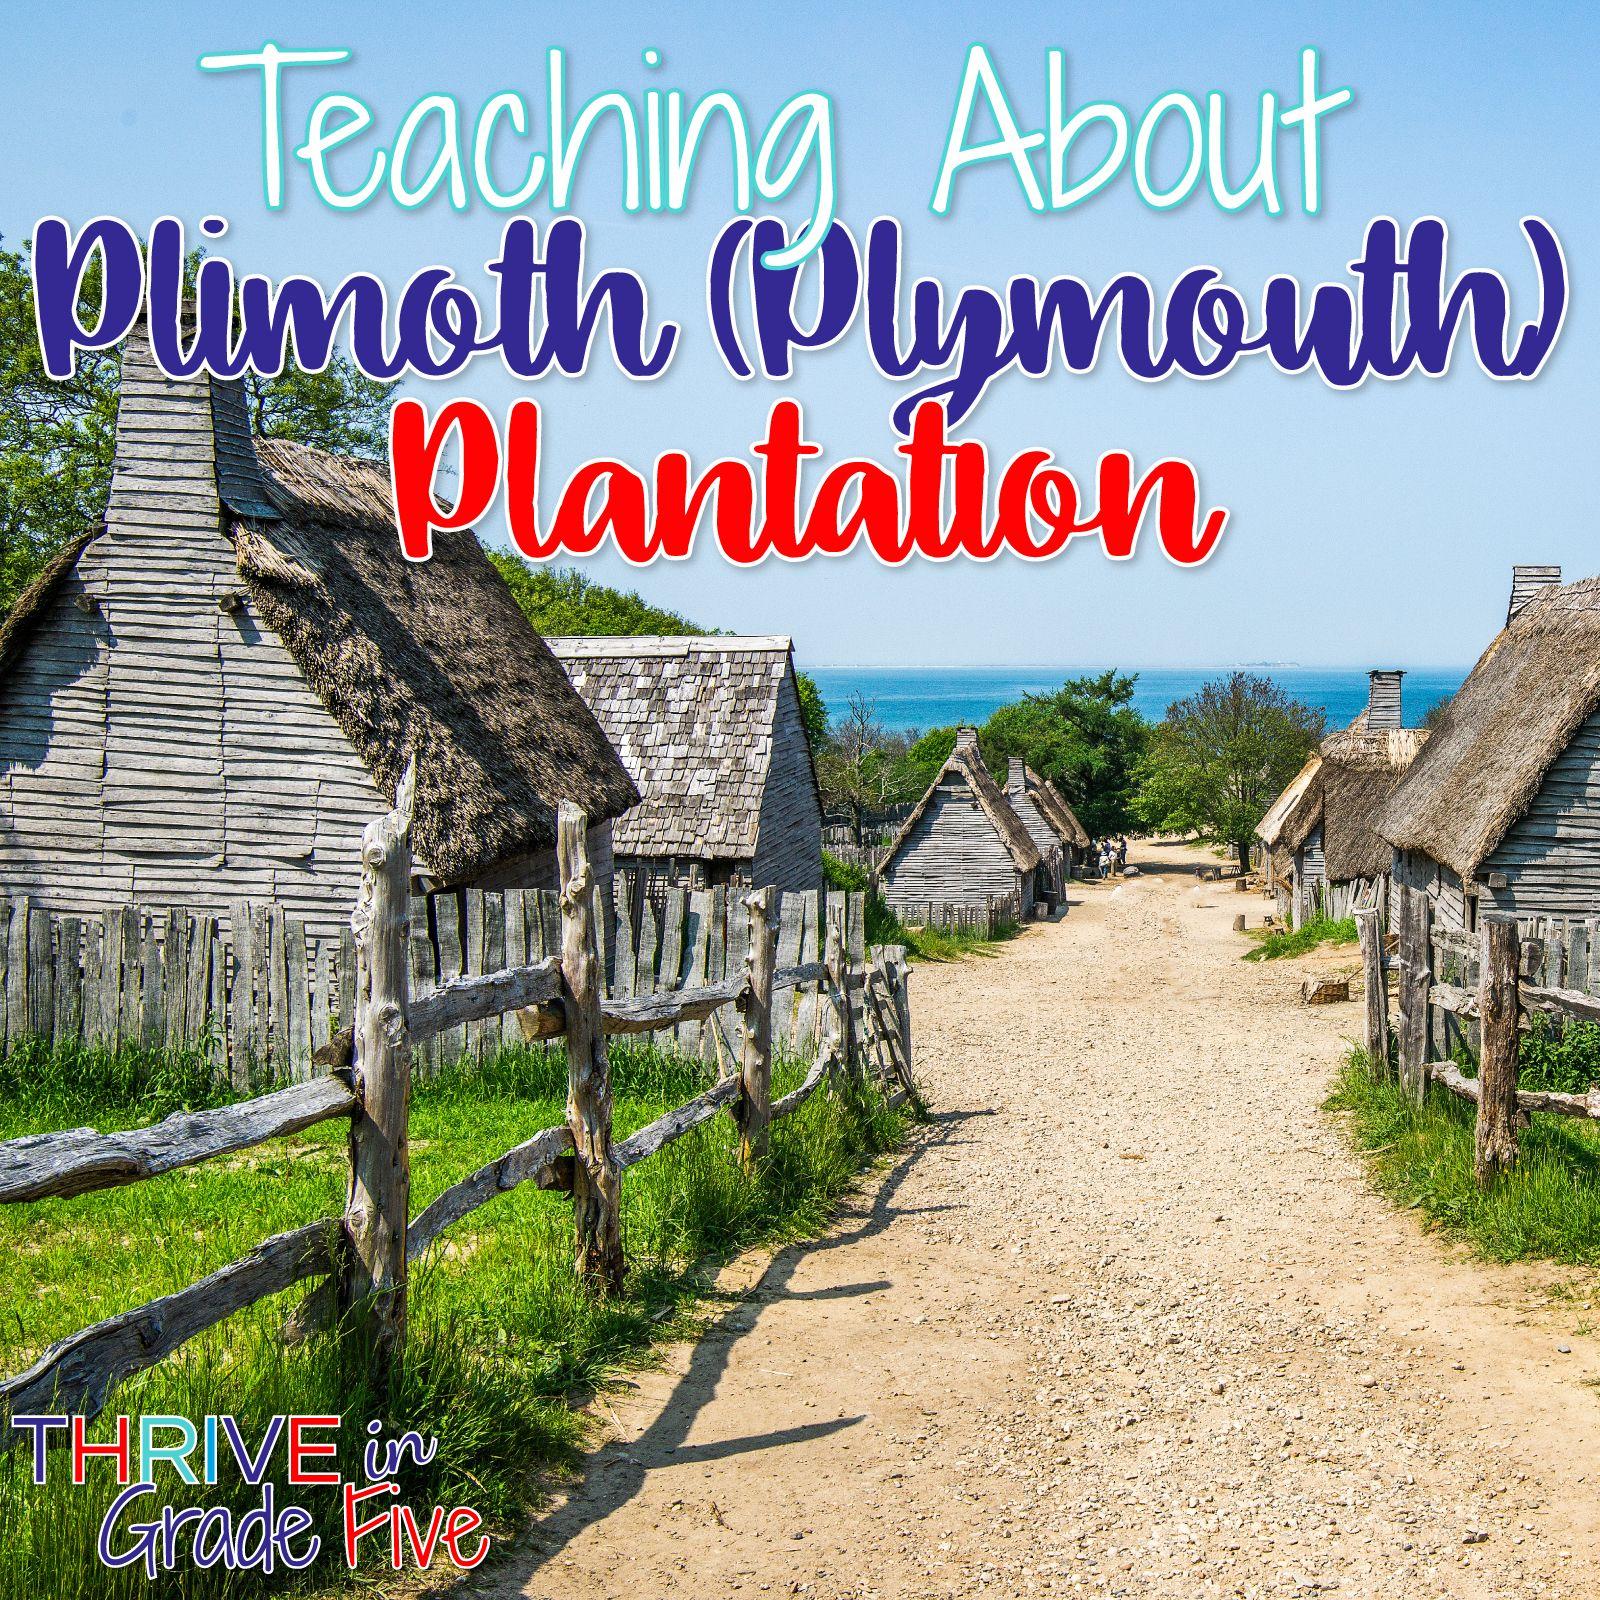 Teaching About Plimoth (Plymouth) Plantation homeschool